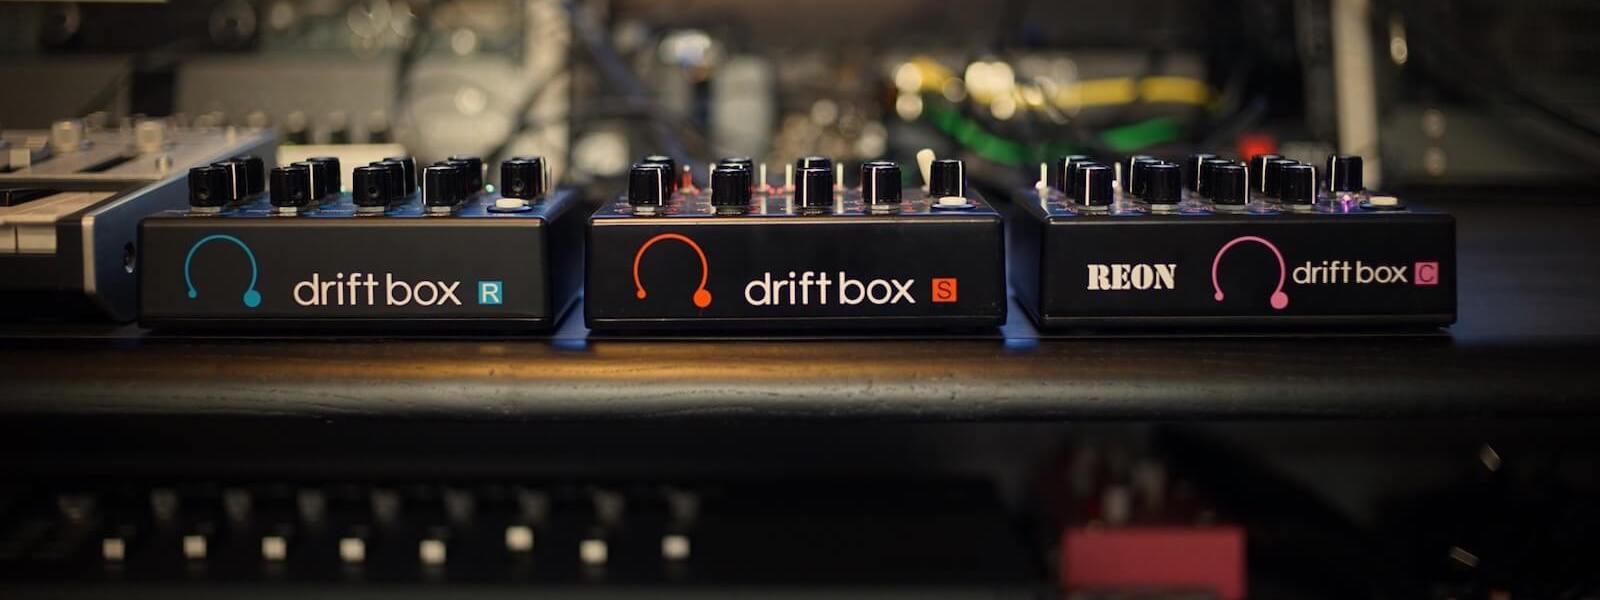 20170706_reon_driftbox_dsc09951_1600_tiny2